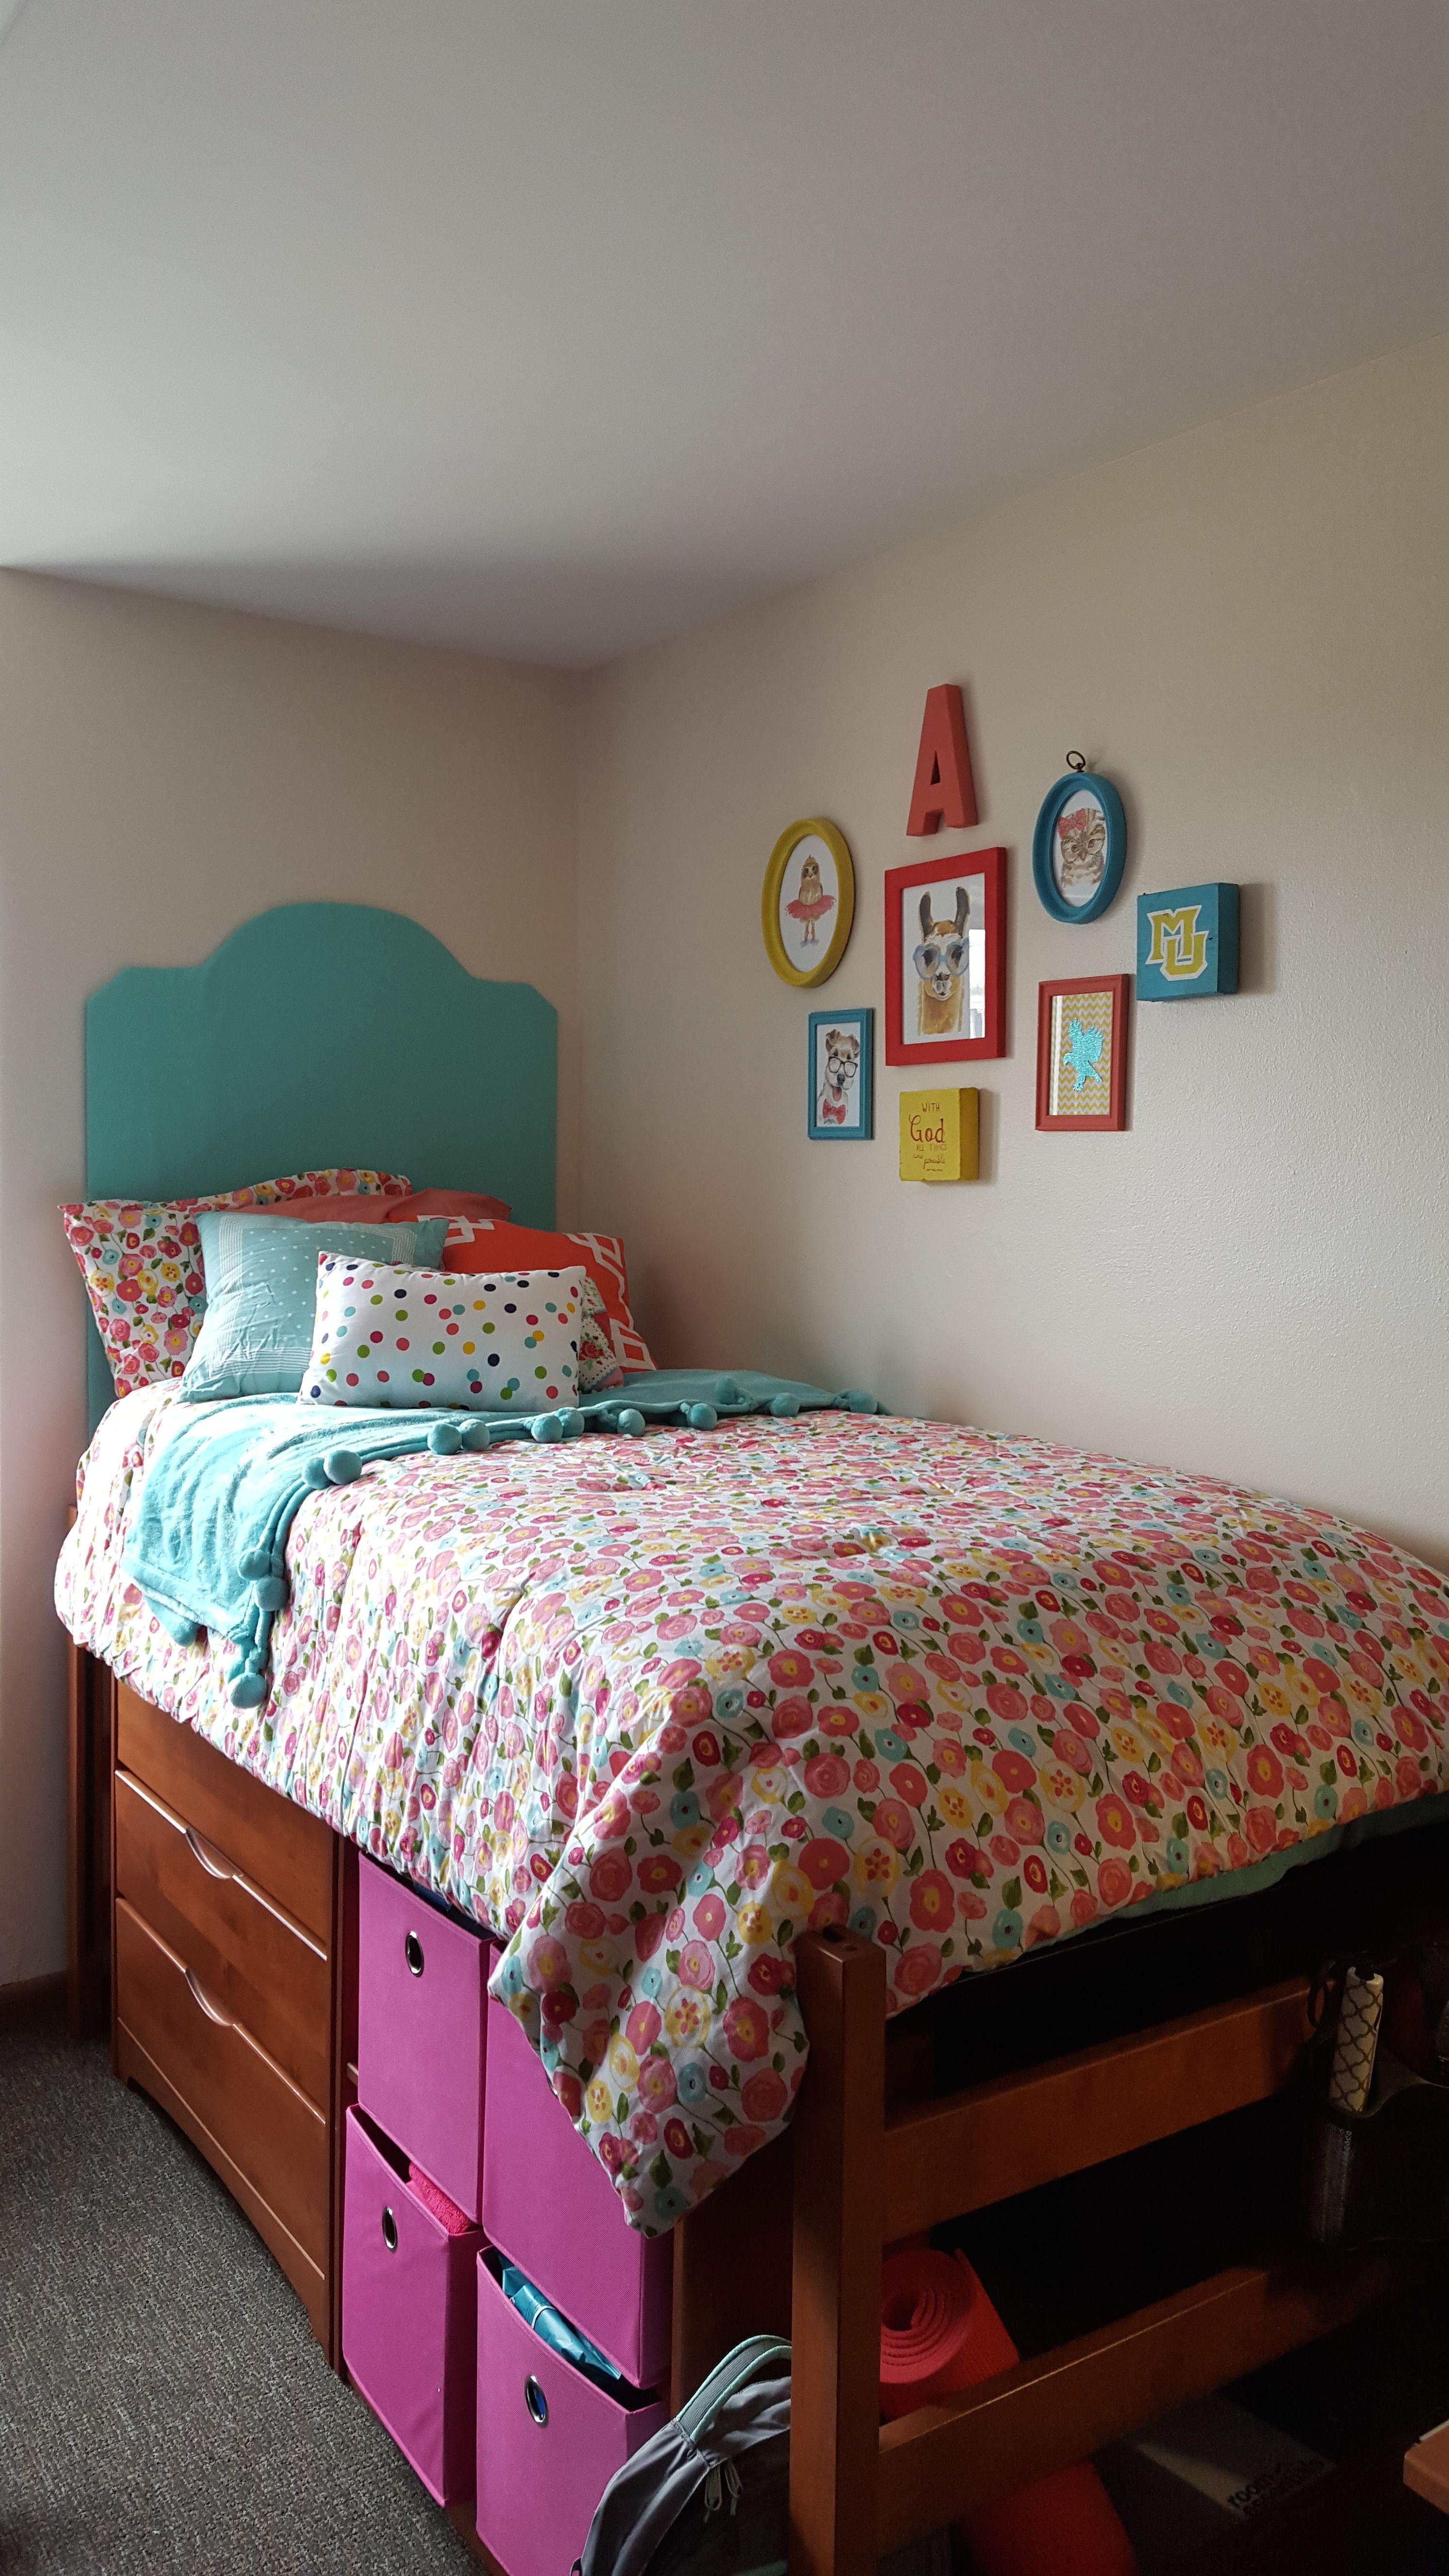 My freshman dorm room at Marquette University DIY art and headboard